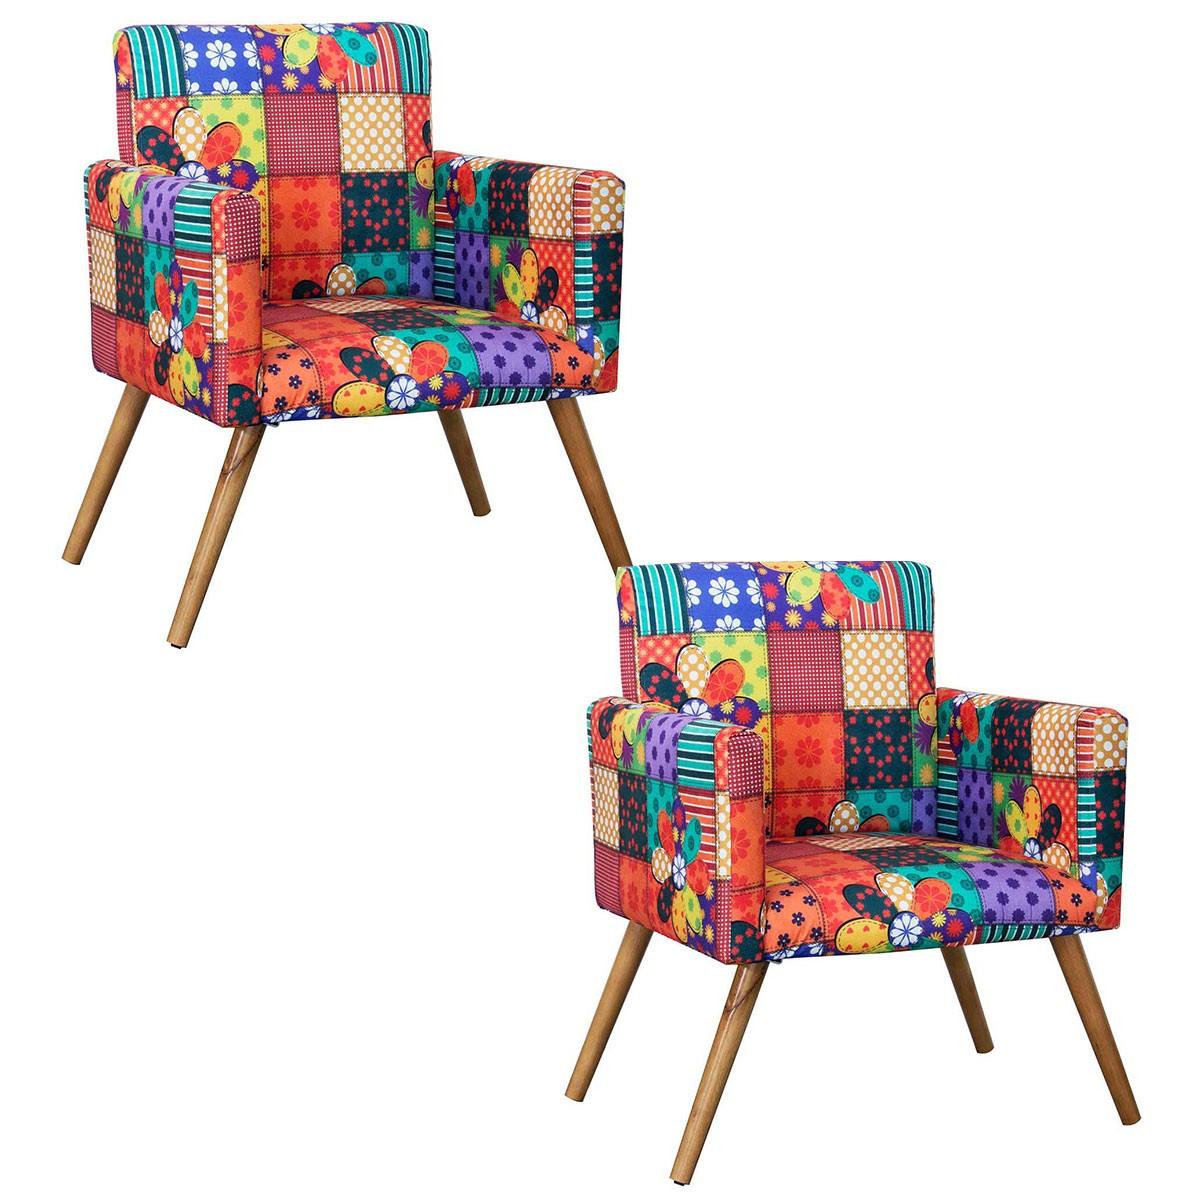 Kit 2 Poltronas Decorativas Nina Pé Palito Primavera